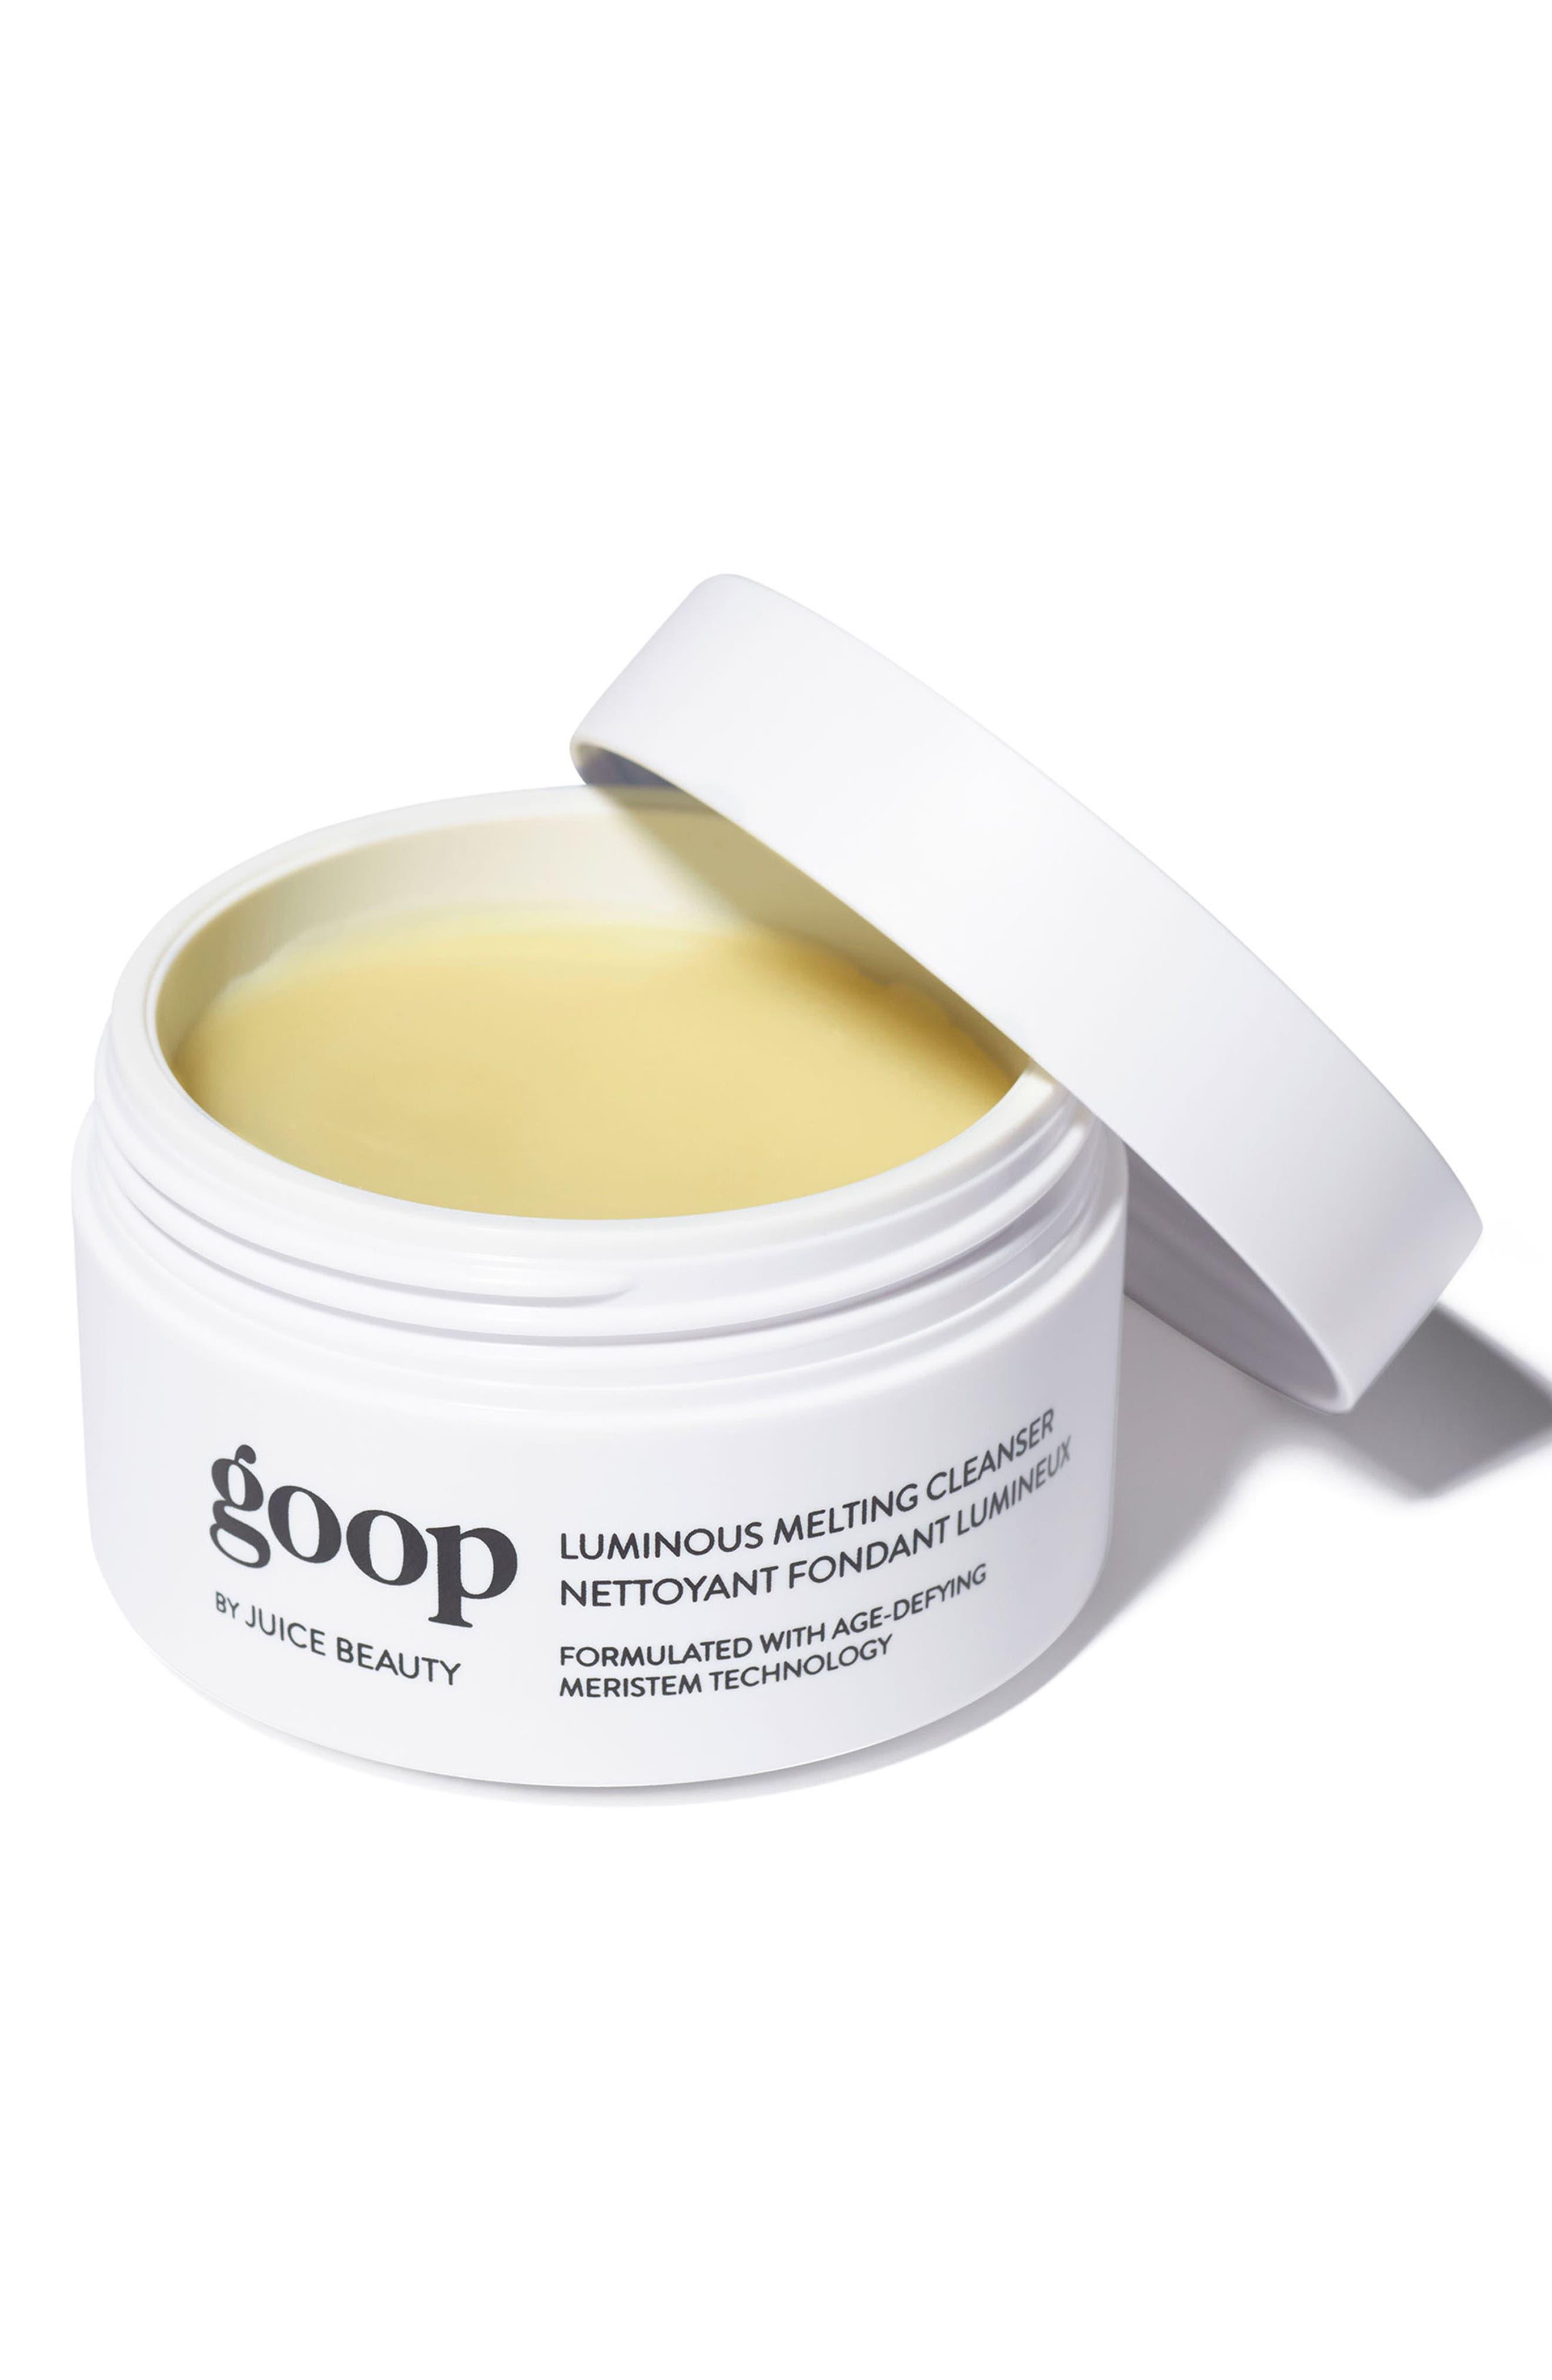 GOOP, by Juice Beauty Luminous Melting Cleanser, Alternate thumbnail 2, color, 000